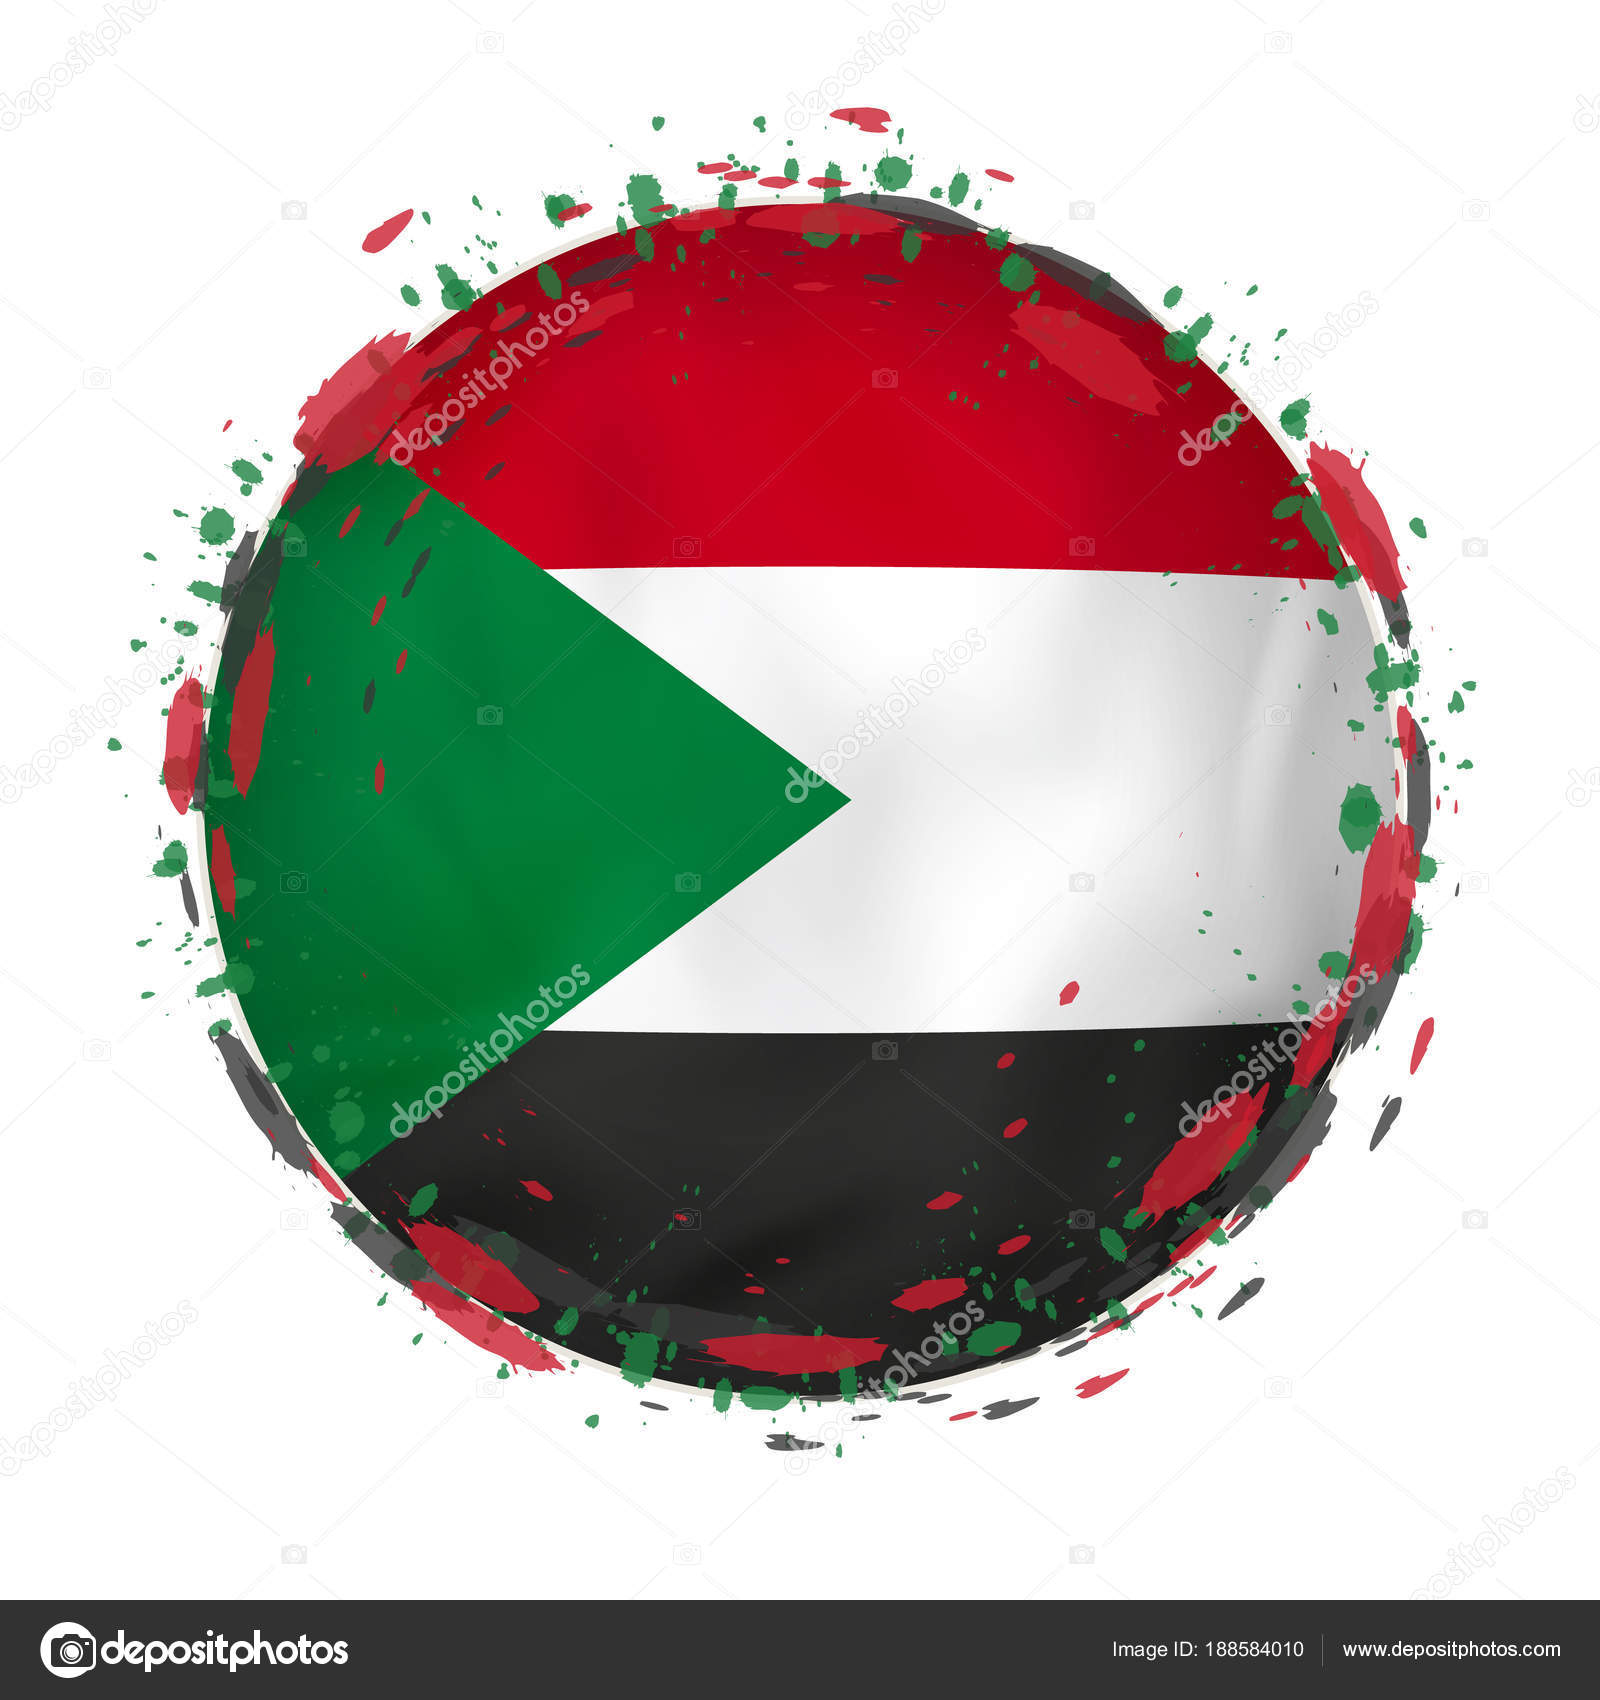 Sudan grunge flag photo